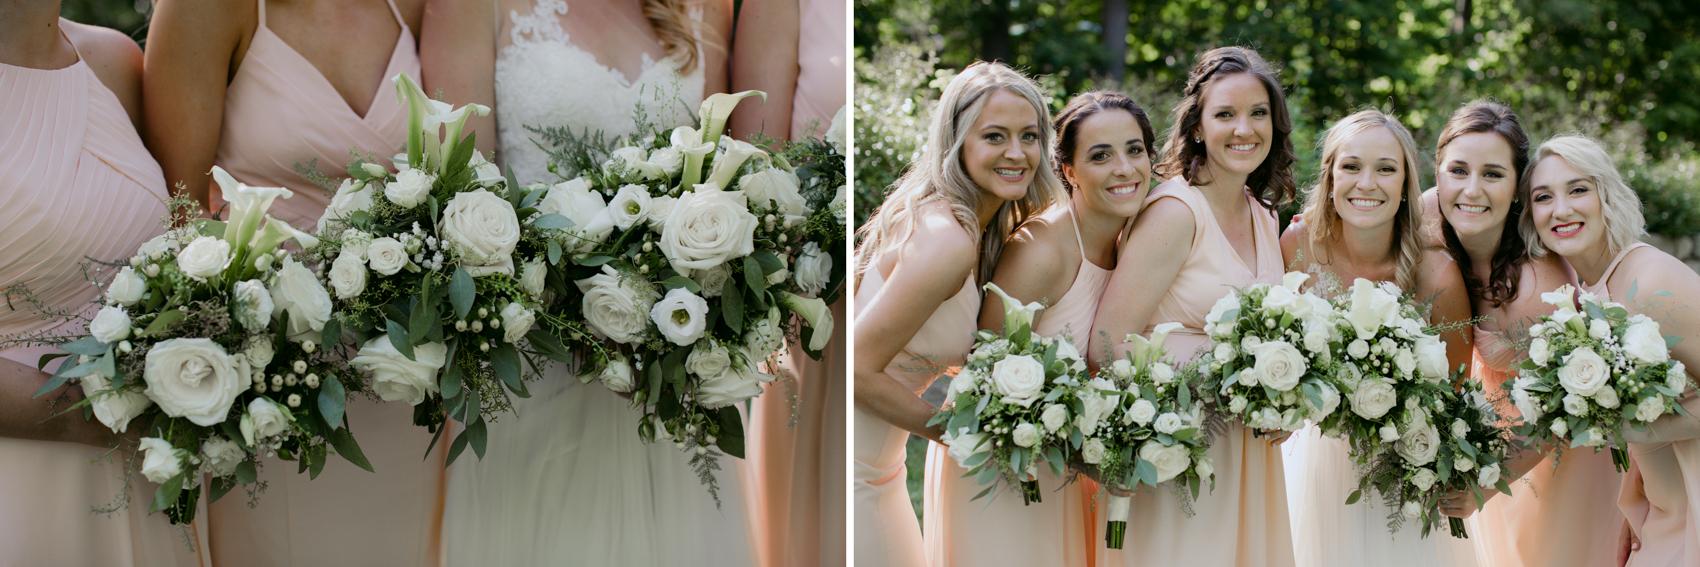 alli_dave_thompson_inn_portsmouth_new_Hampshire_wedding_007.jpg